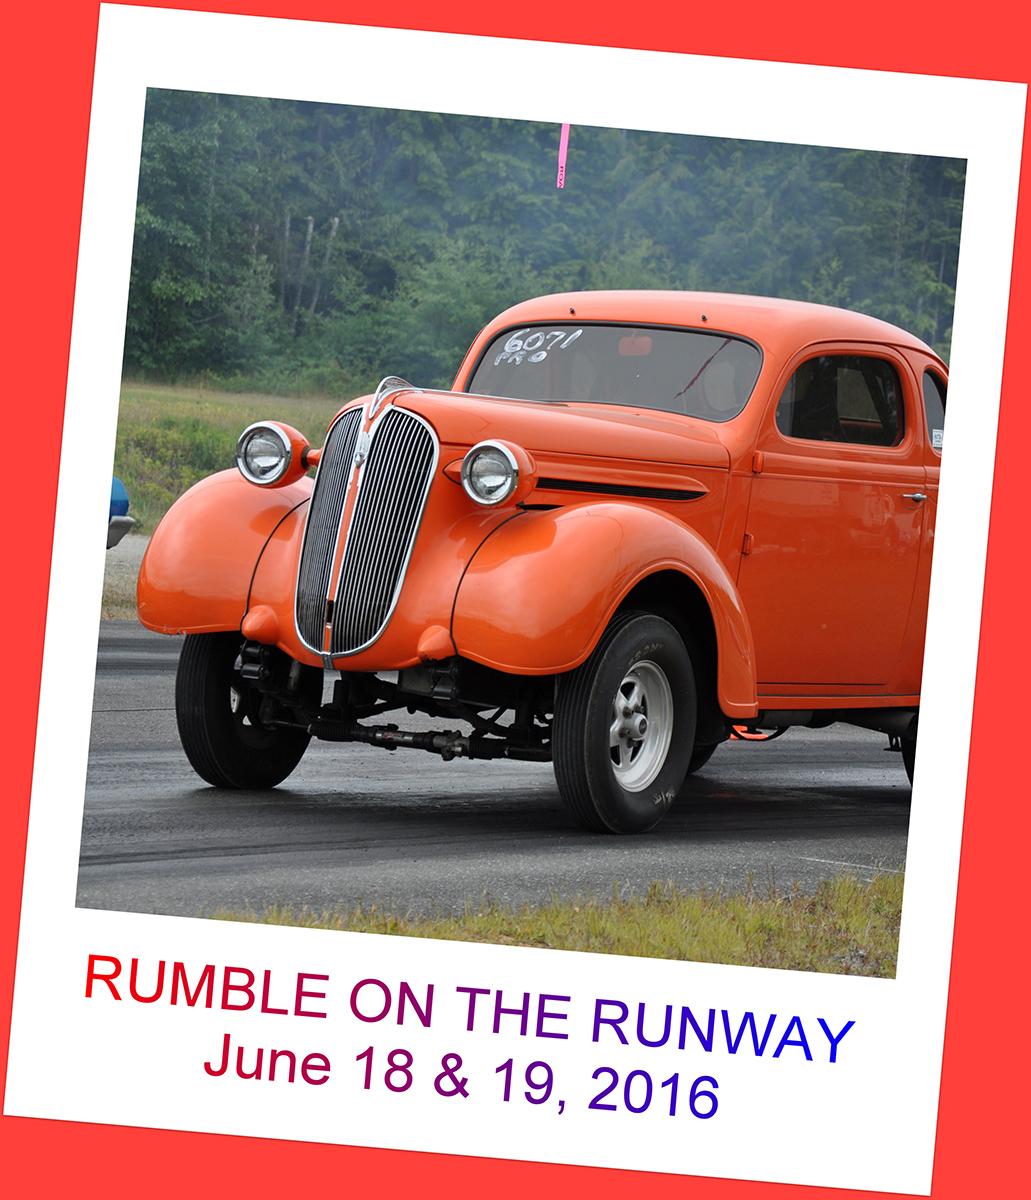 Rumble on the Runway June 18 & 19, 2016 1246